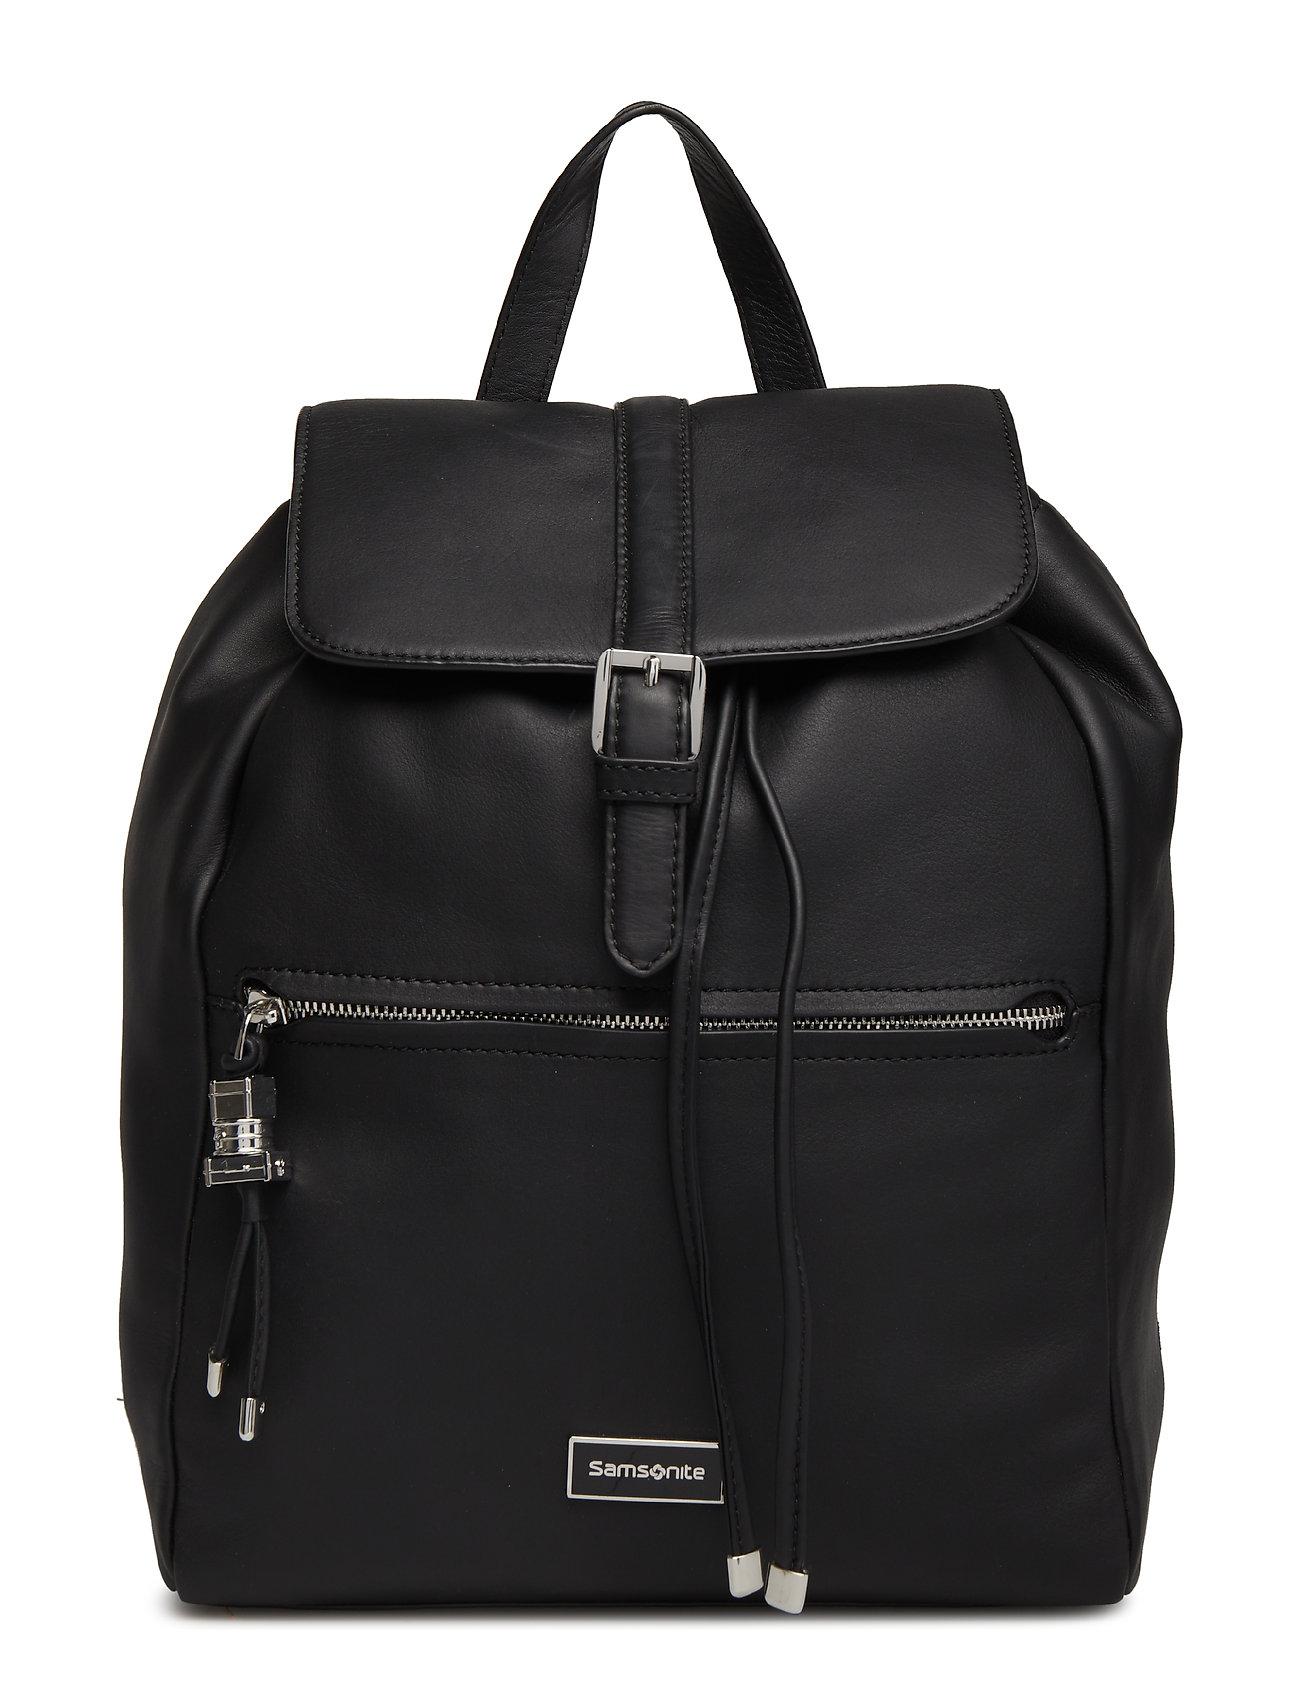 Samsonite Karissa Biz Lth Backpack S